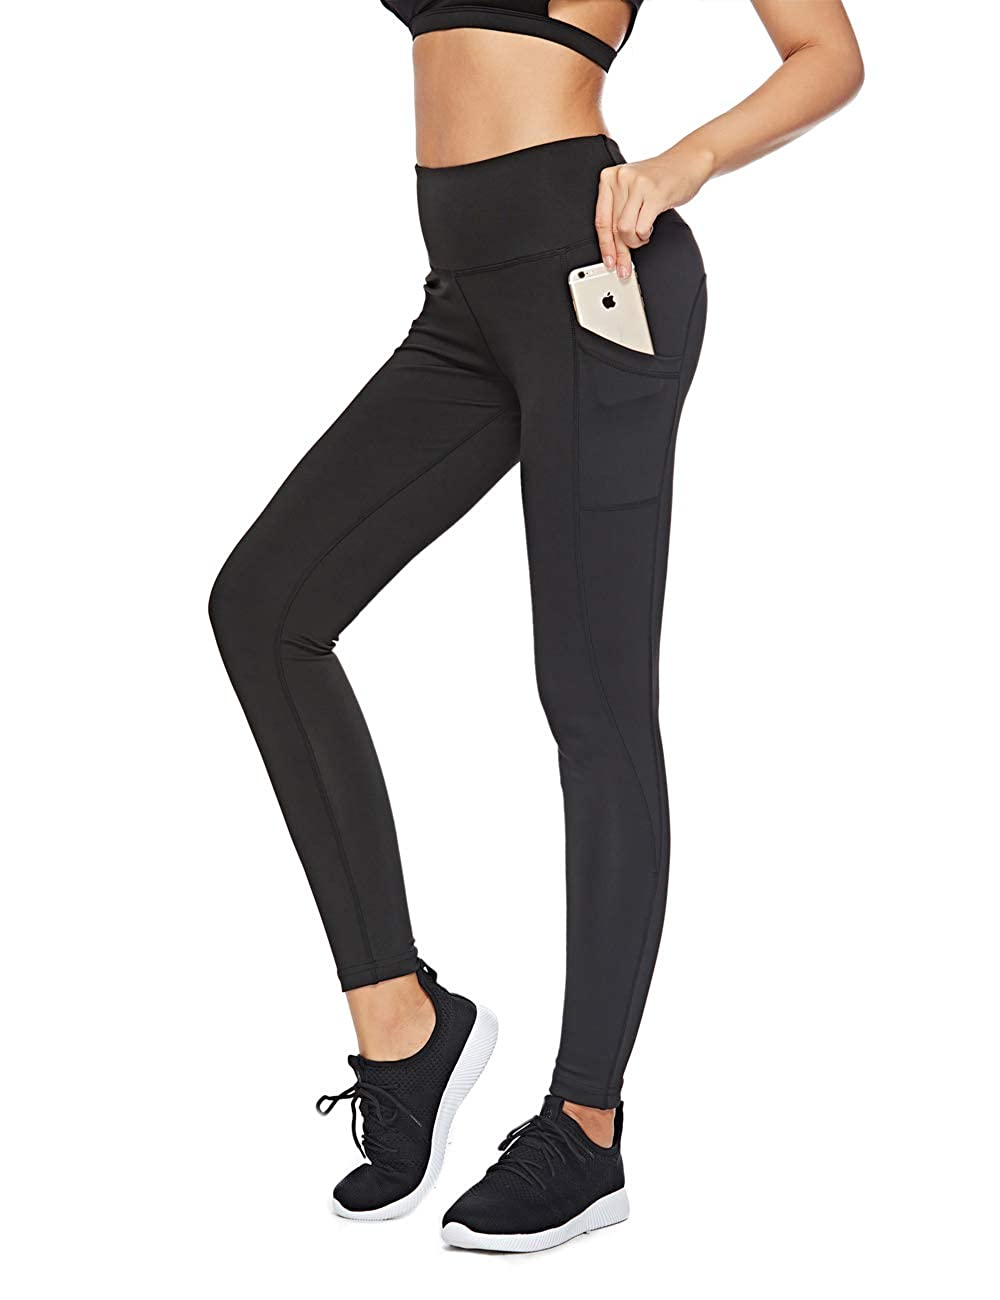 Black SXT High Waist Out Pocket Yoga Pants Tummy Control Workout Running Compression Scrunch Butt Leggings